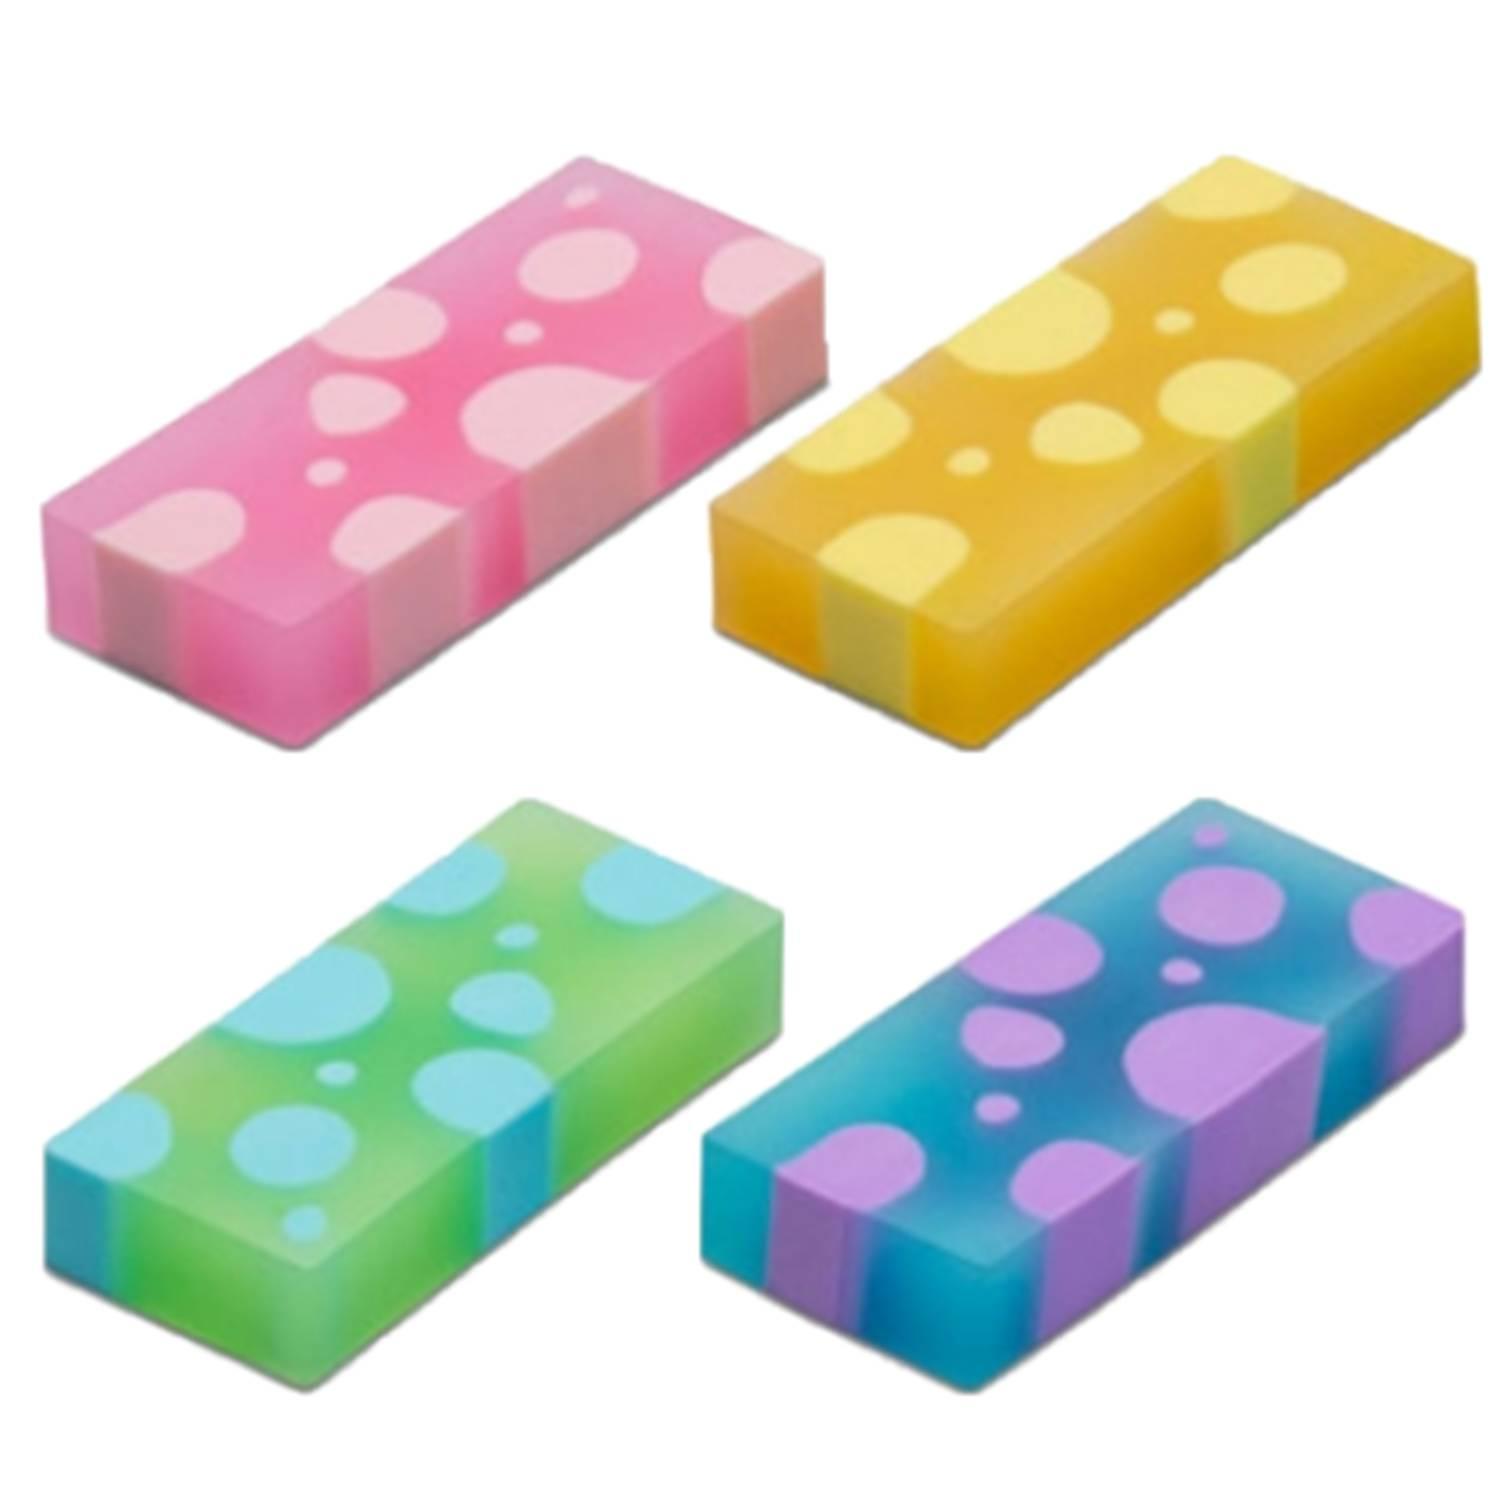 Borracha Jelly Tris  - Bibiane Papelaria